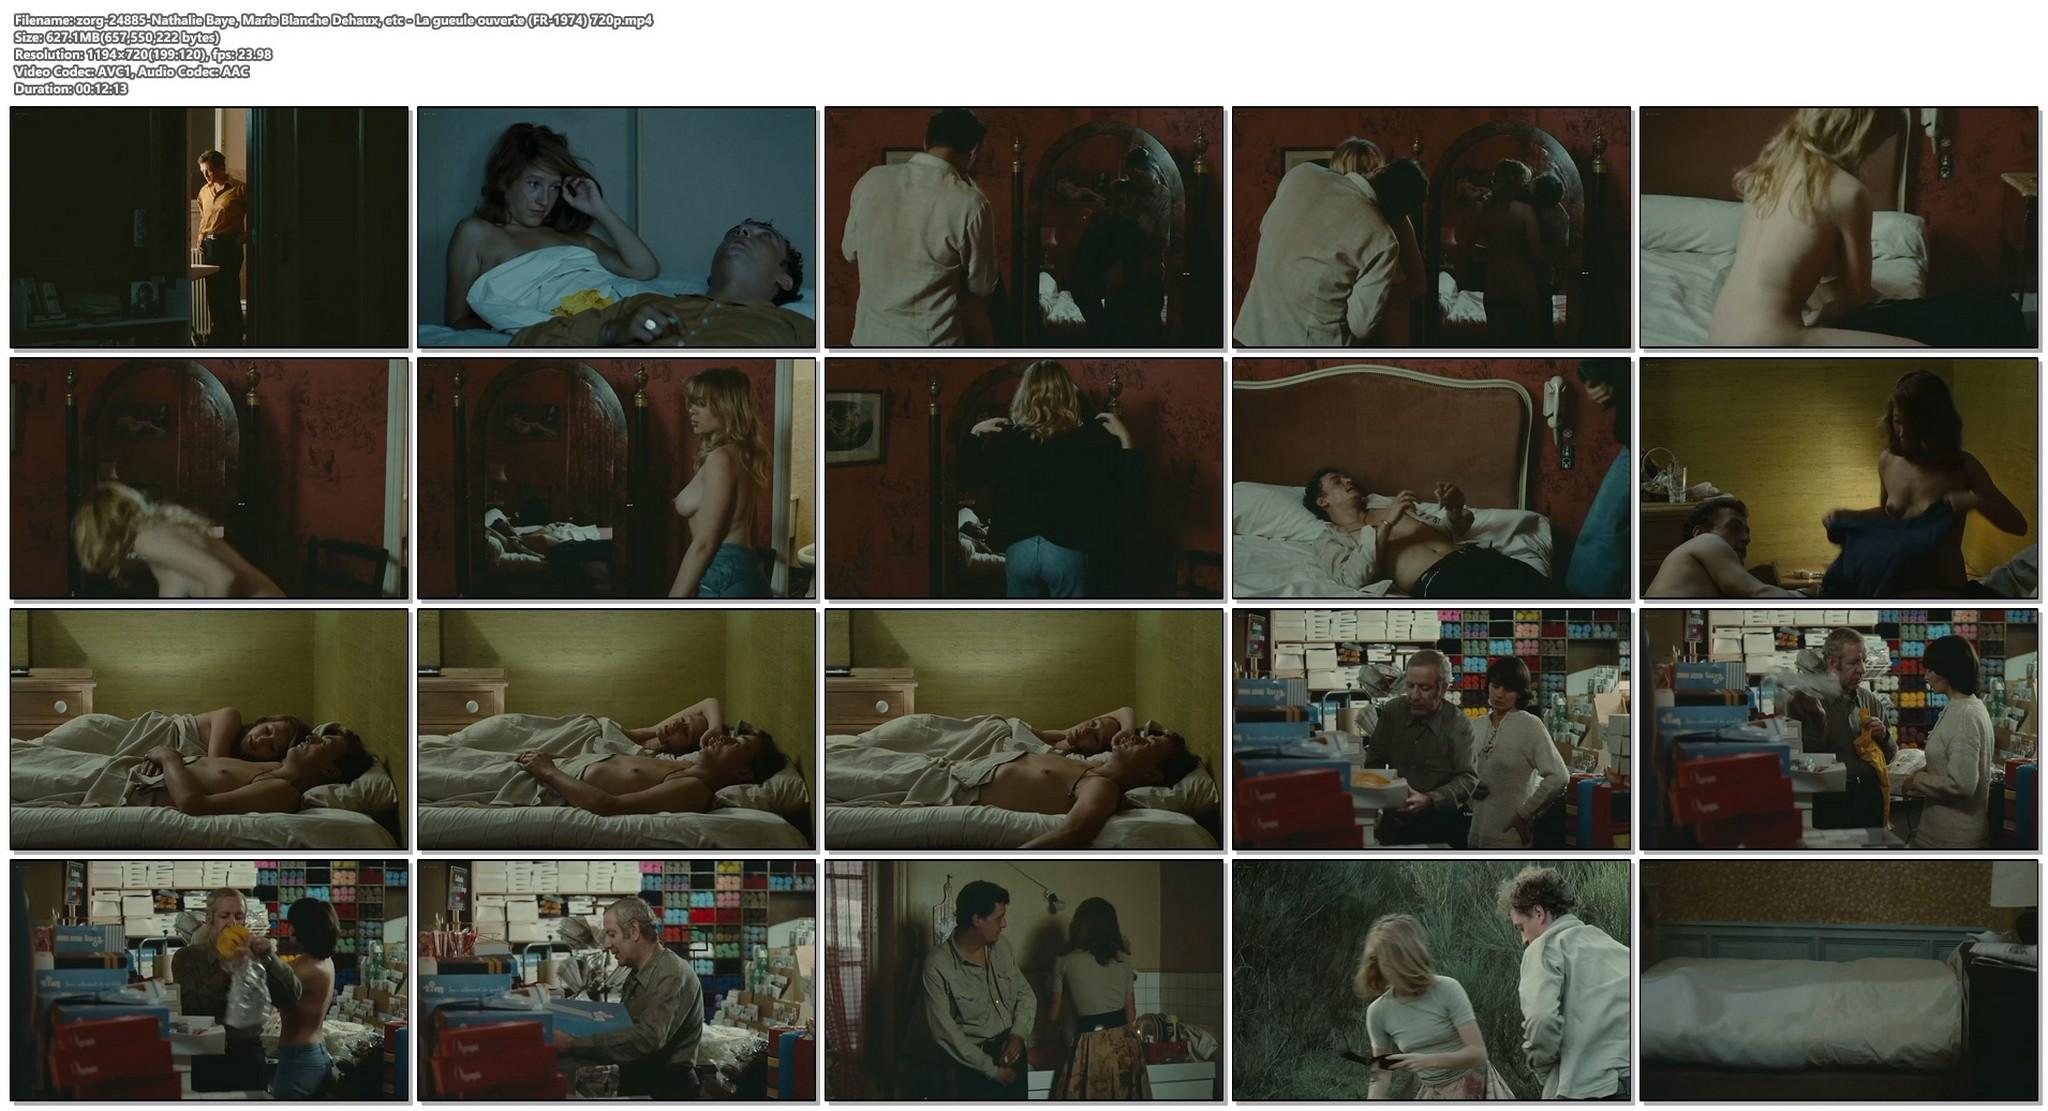 Nathalie Baye nude Marie Blanche Dehaux full frontal etc La gueule ouverte FR 1974 720p 18